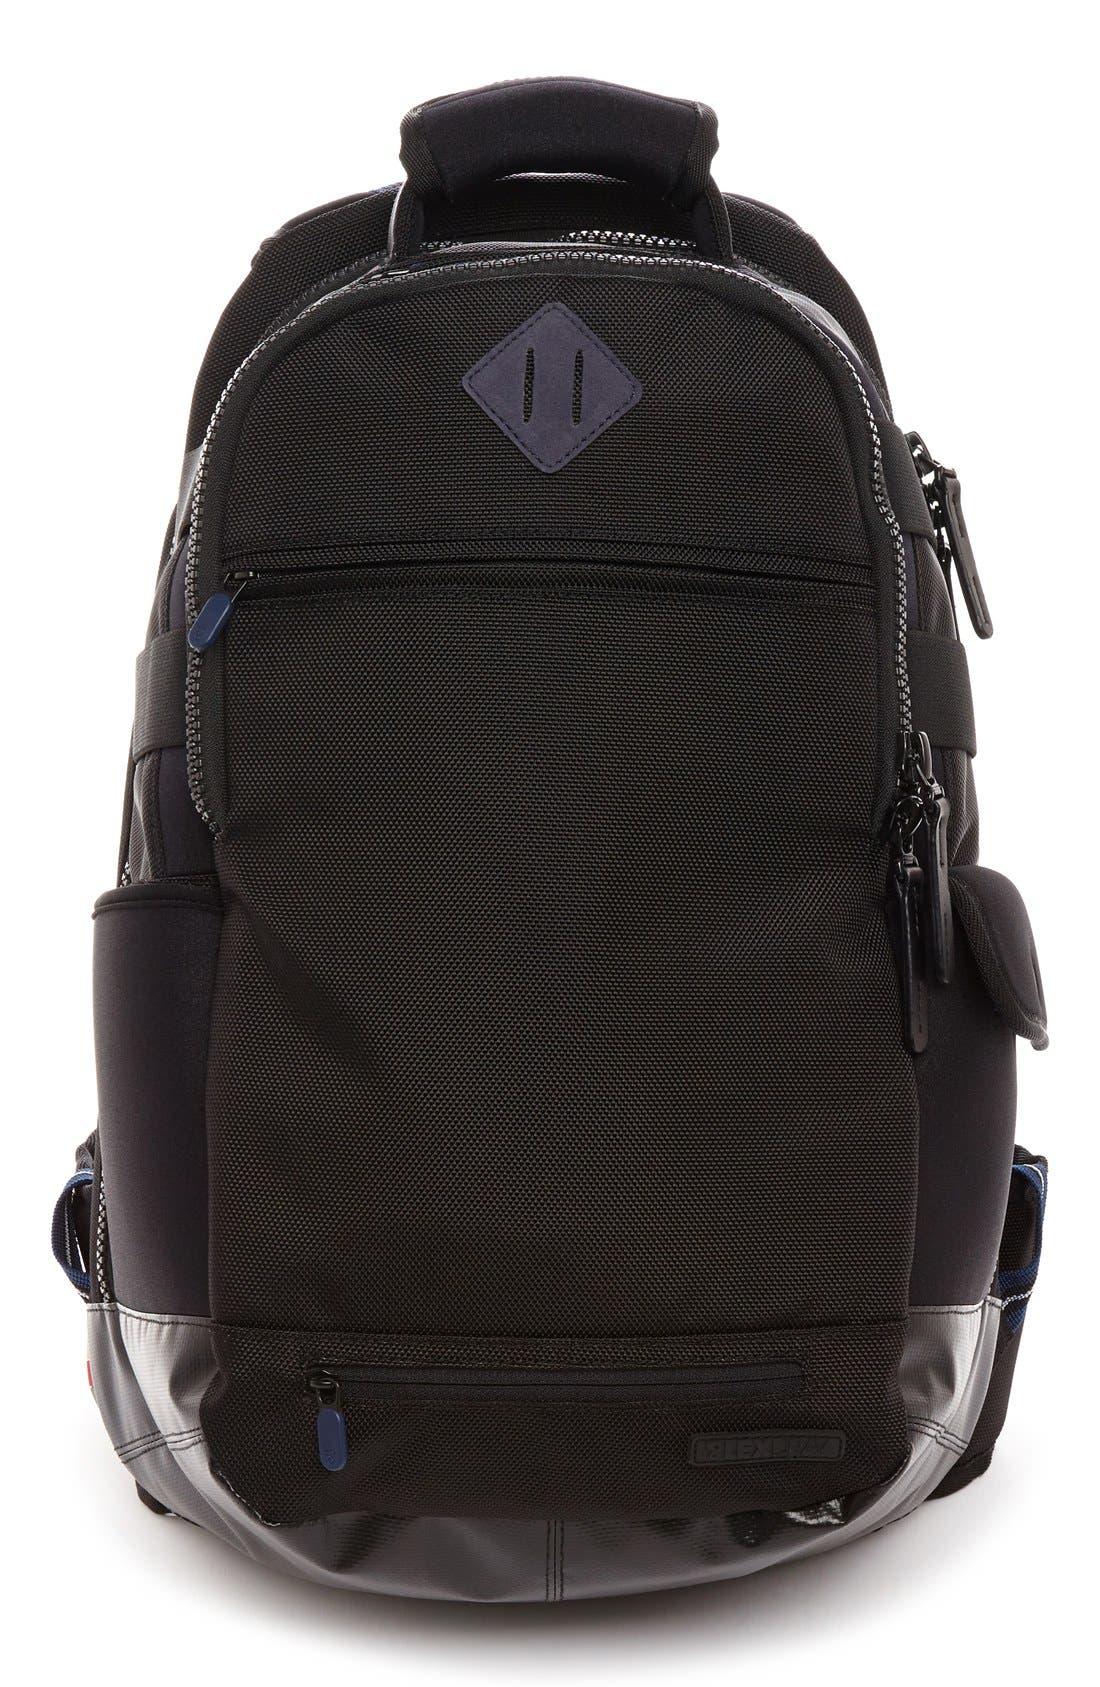 Alternate Image 1 Selected - Lexdray 'Boulder' Backpack